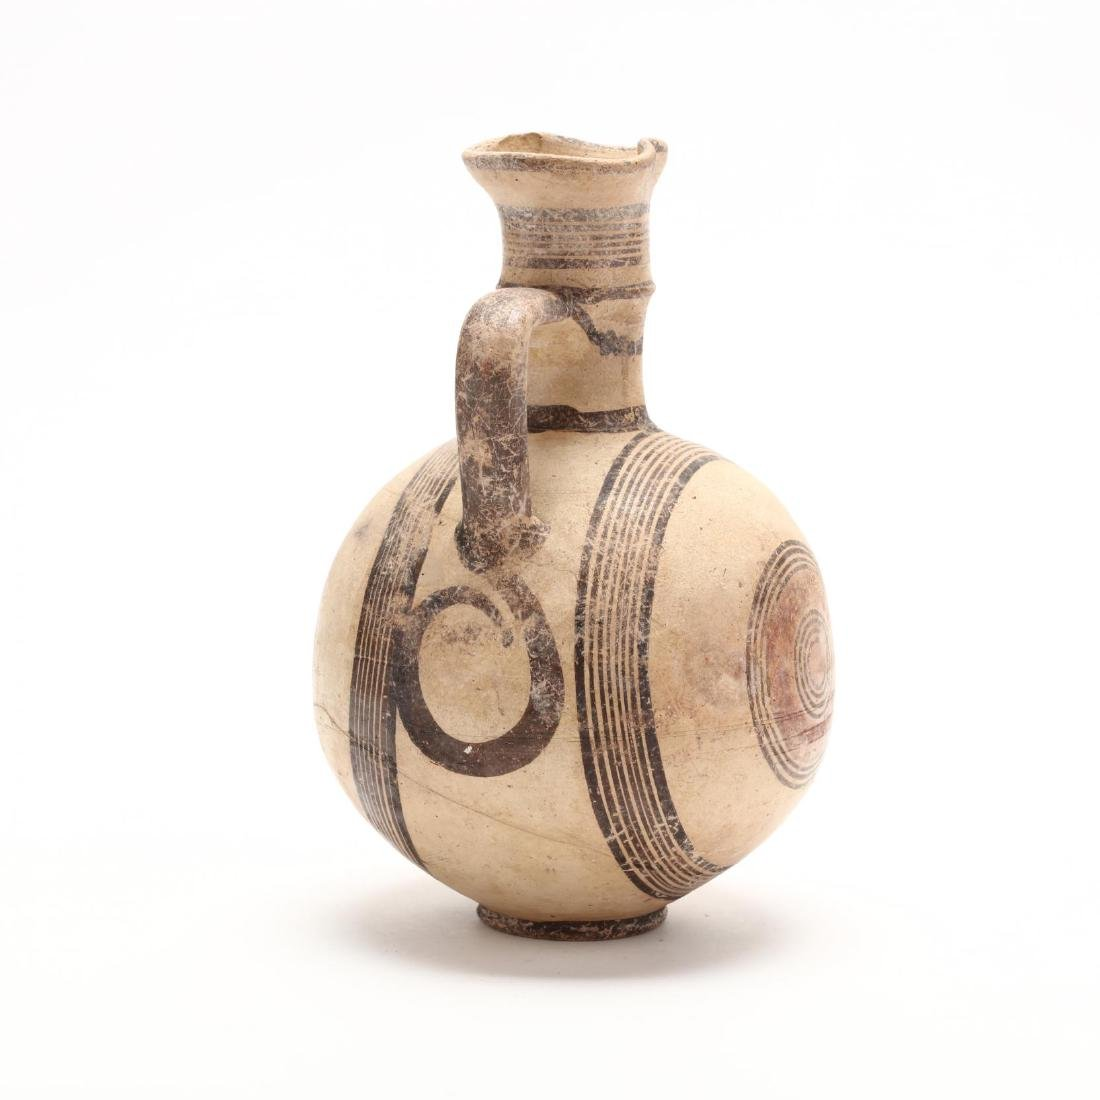 Cyprio-Archaic Barrel Form Bichrome Pitcher - 4